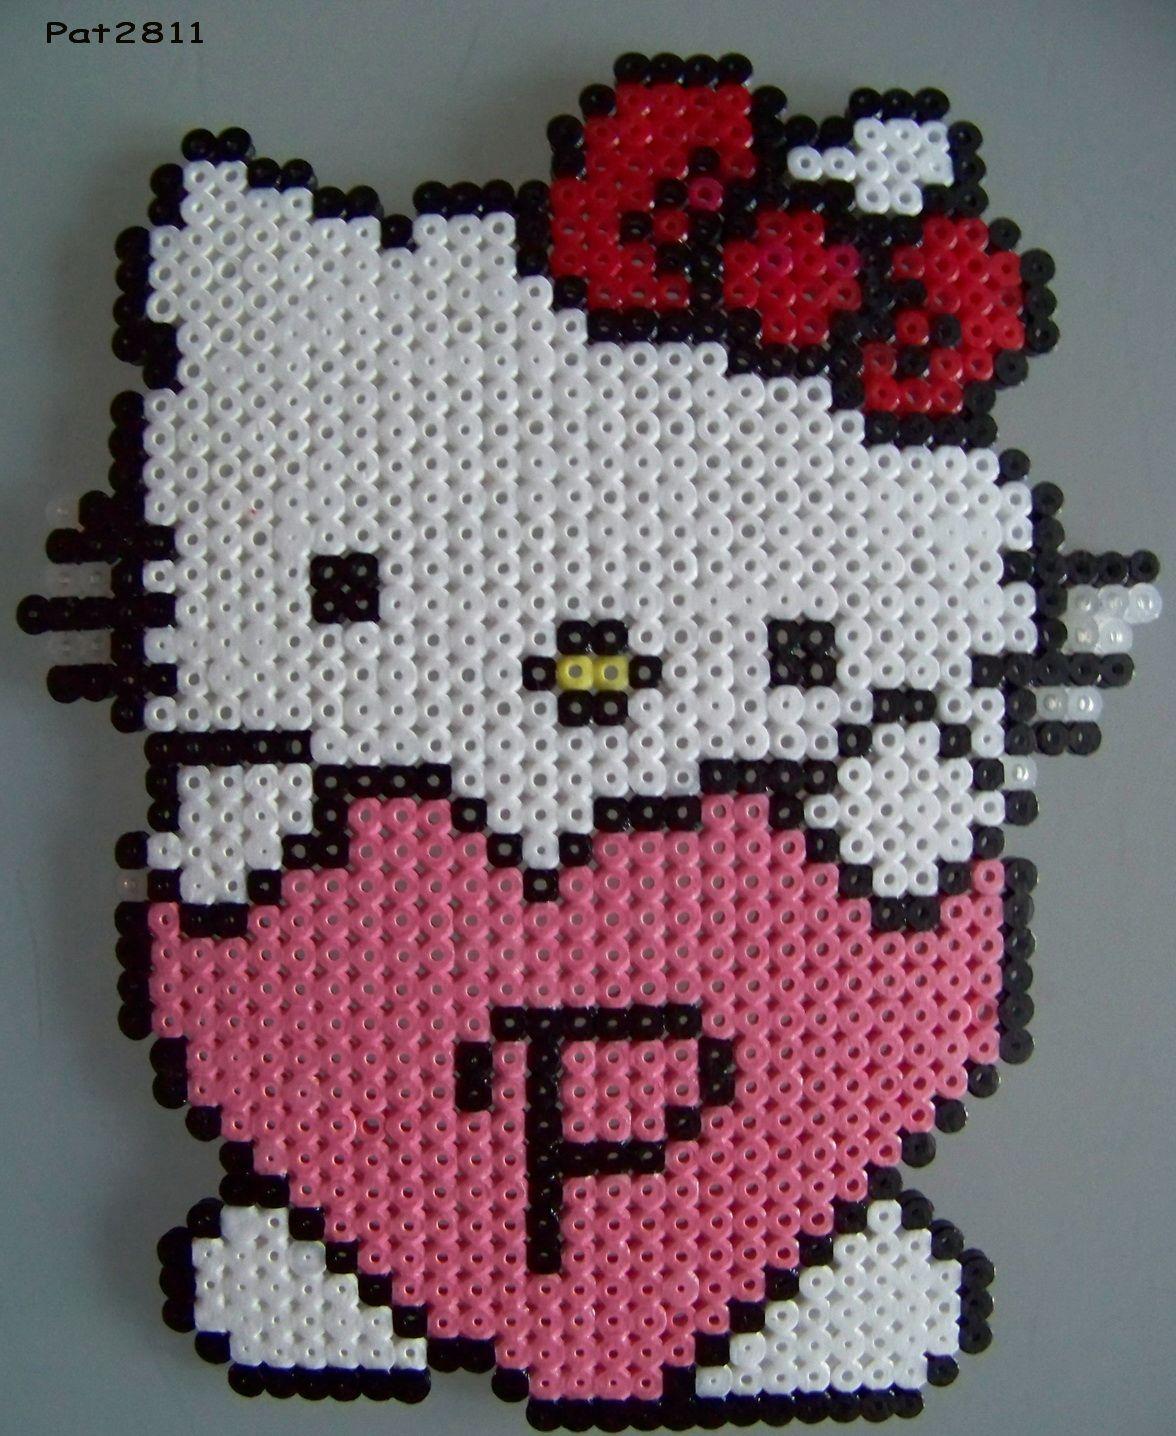 Perles a repasser hello kitty perles chlo perle a repasser modeles perle hama modele et - Modele hello kitty ...